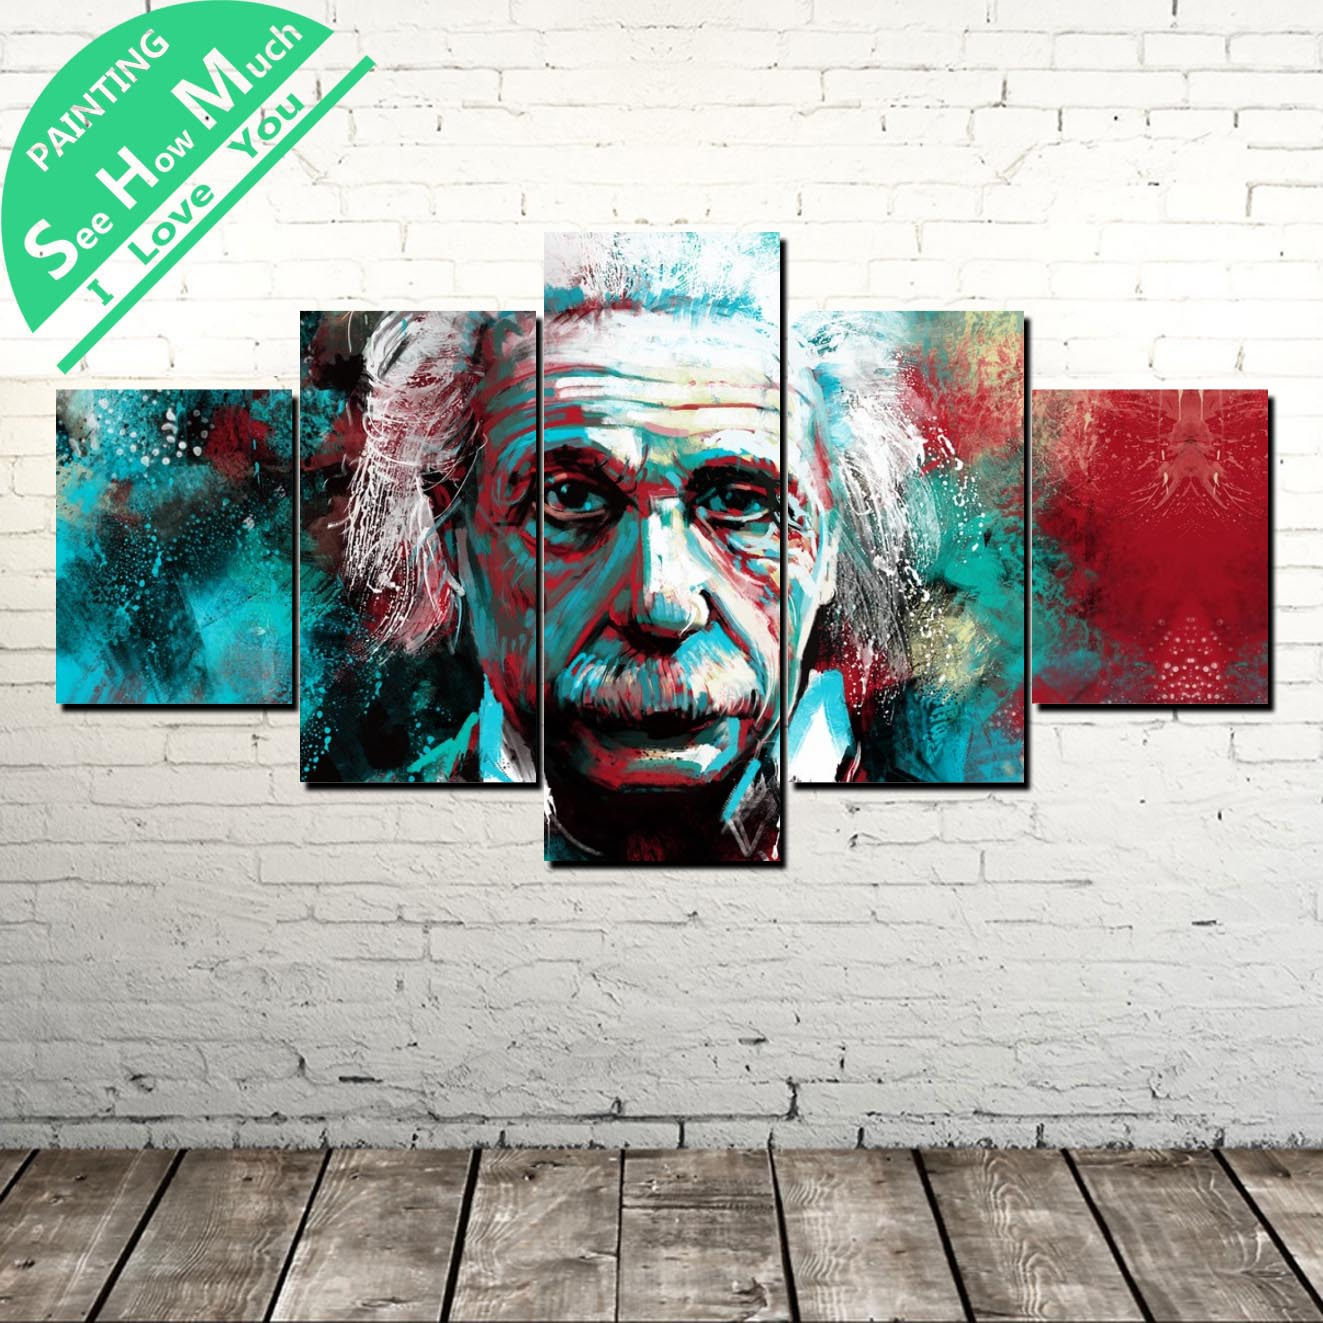 5 Piece Albert Einstein  Modern Artwork Wall Art Canvas Poster and Print Painting Decorative Picture Home Decor